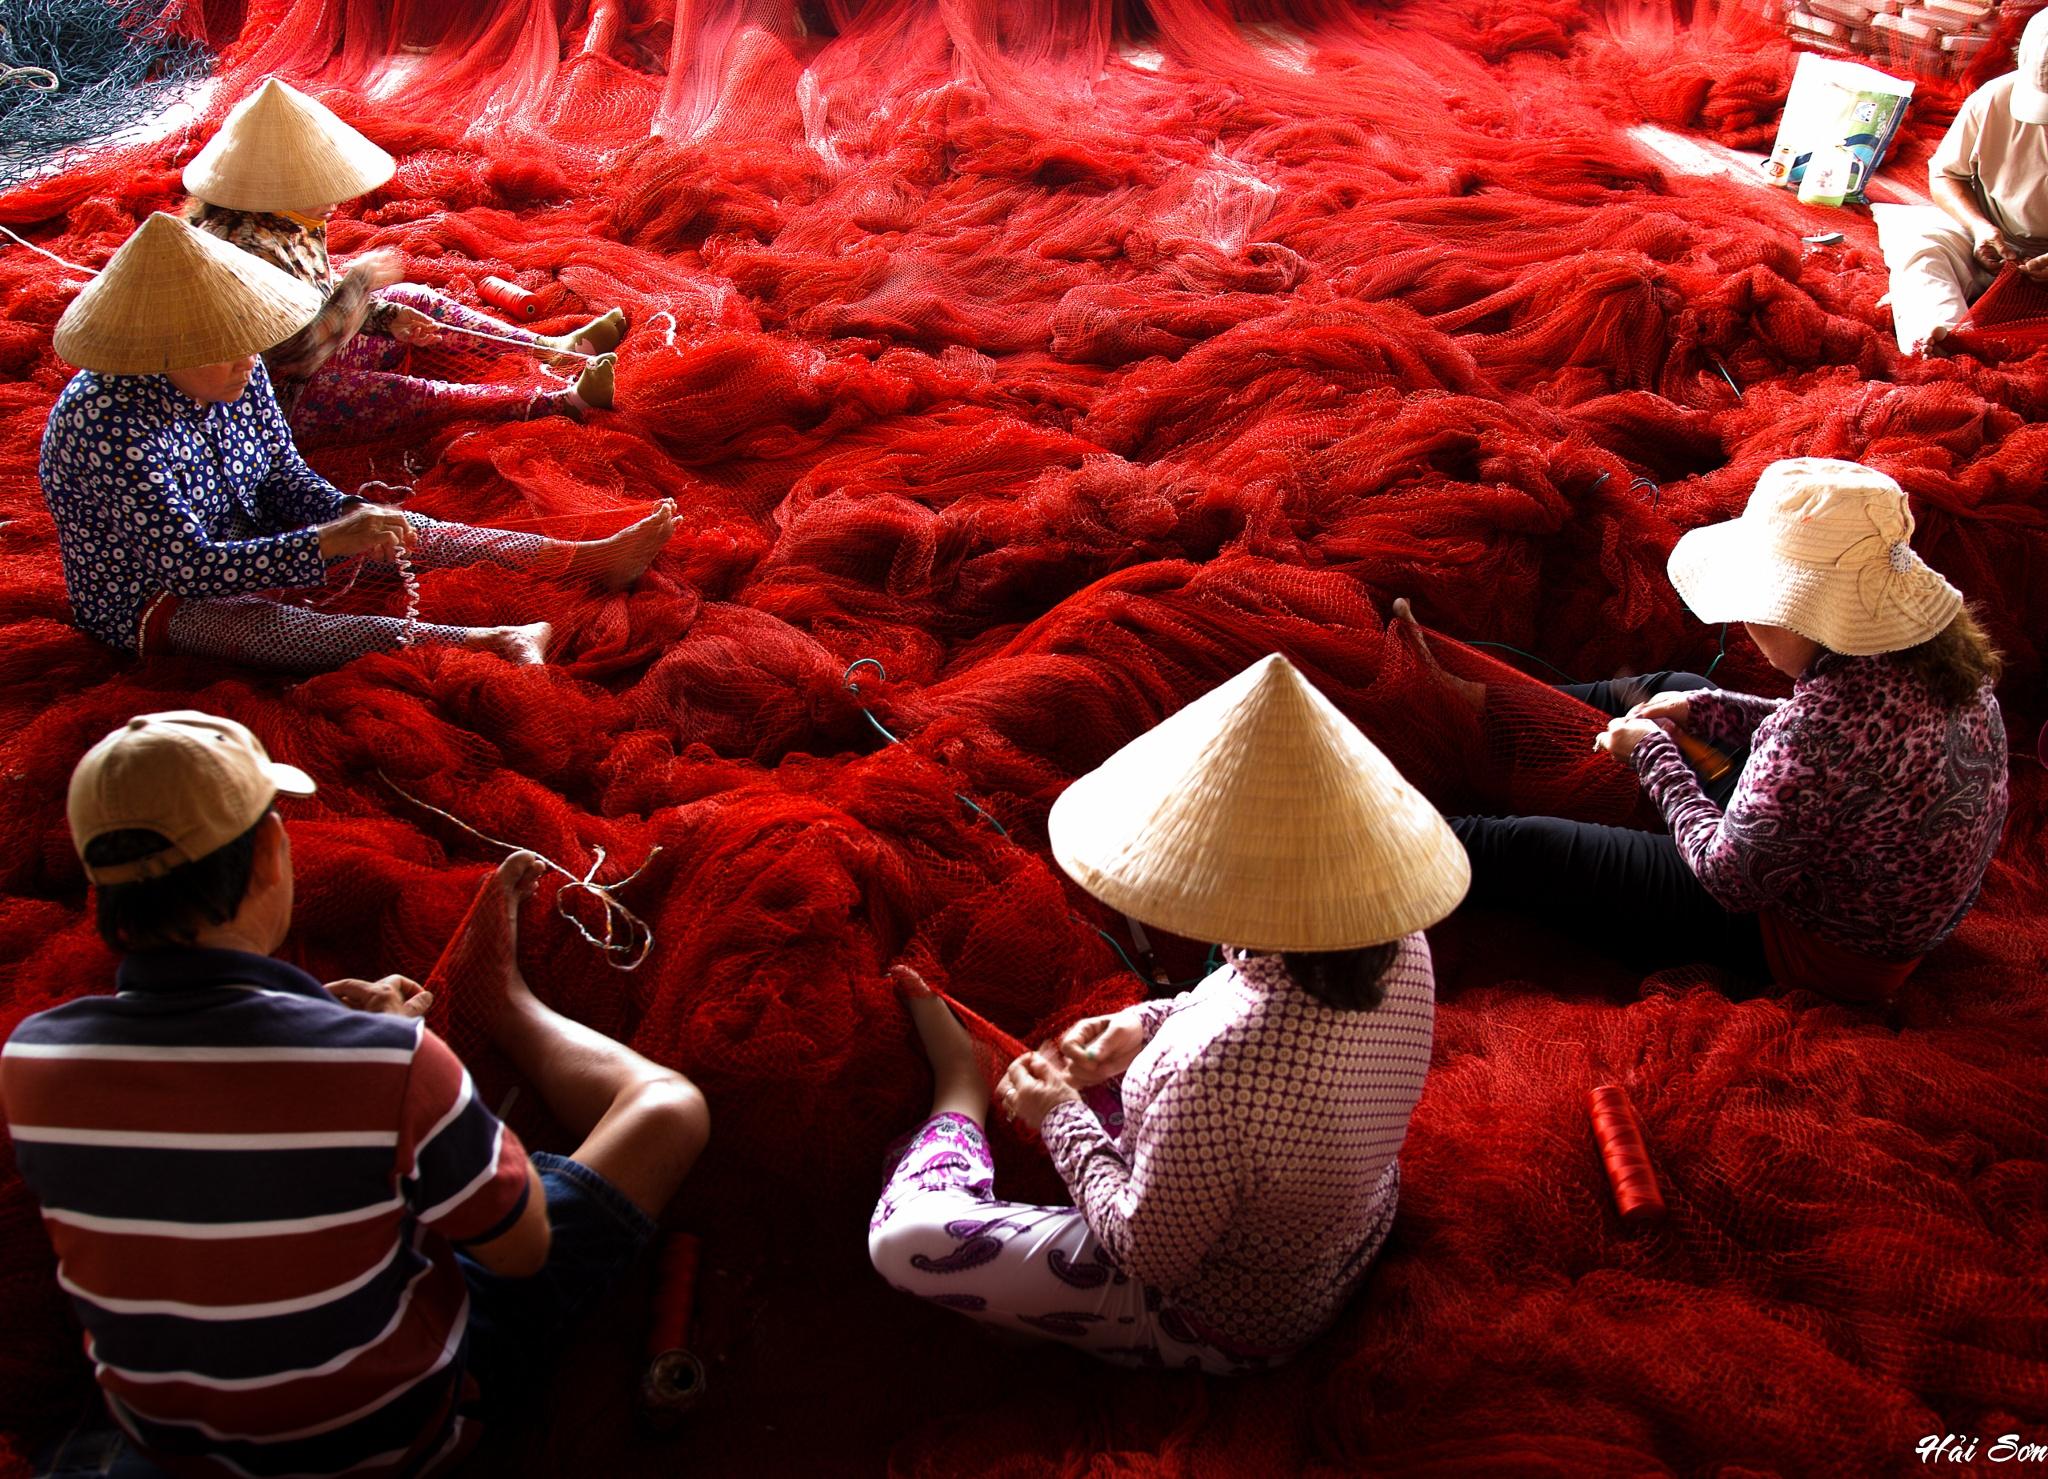 Untitled by Hải Sơn